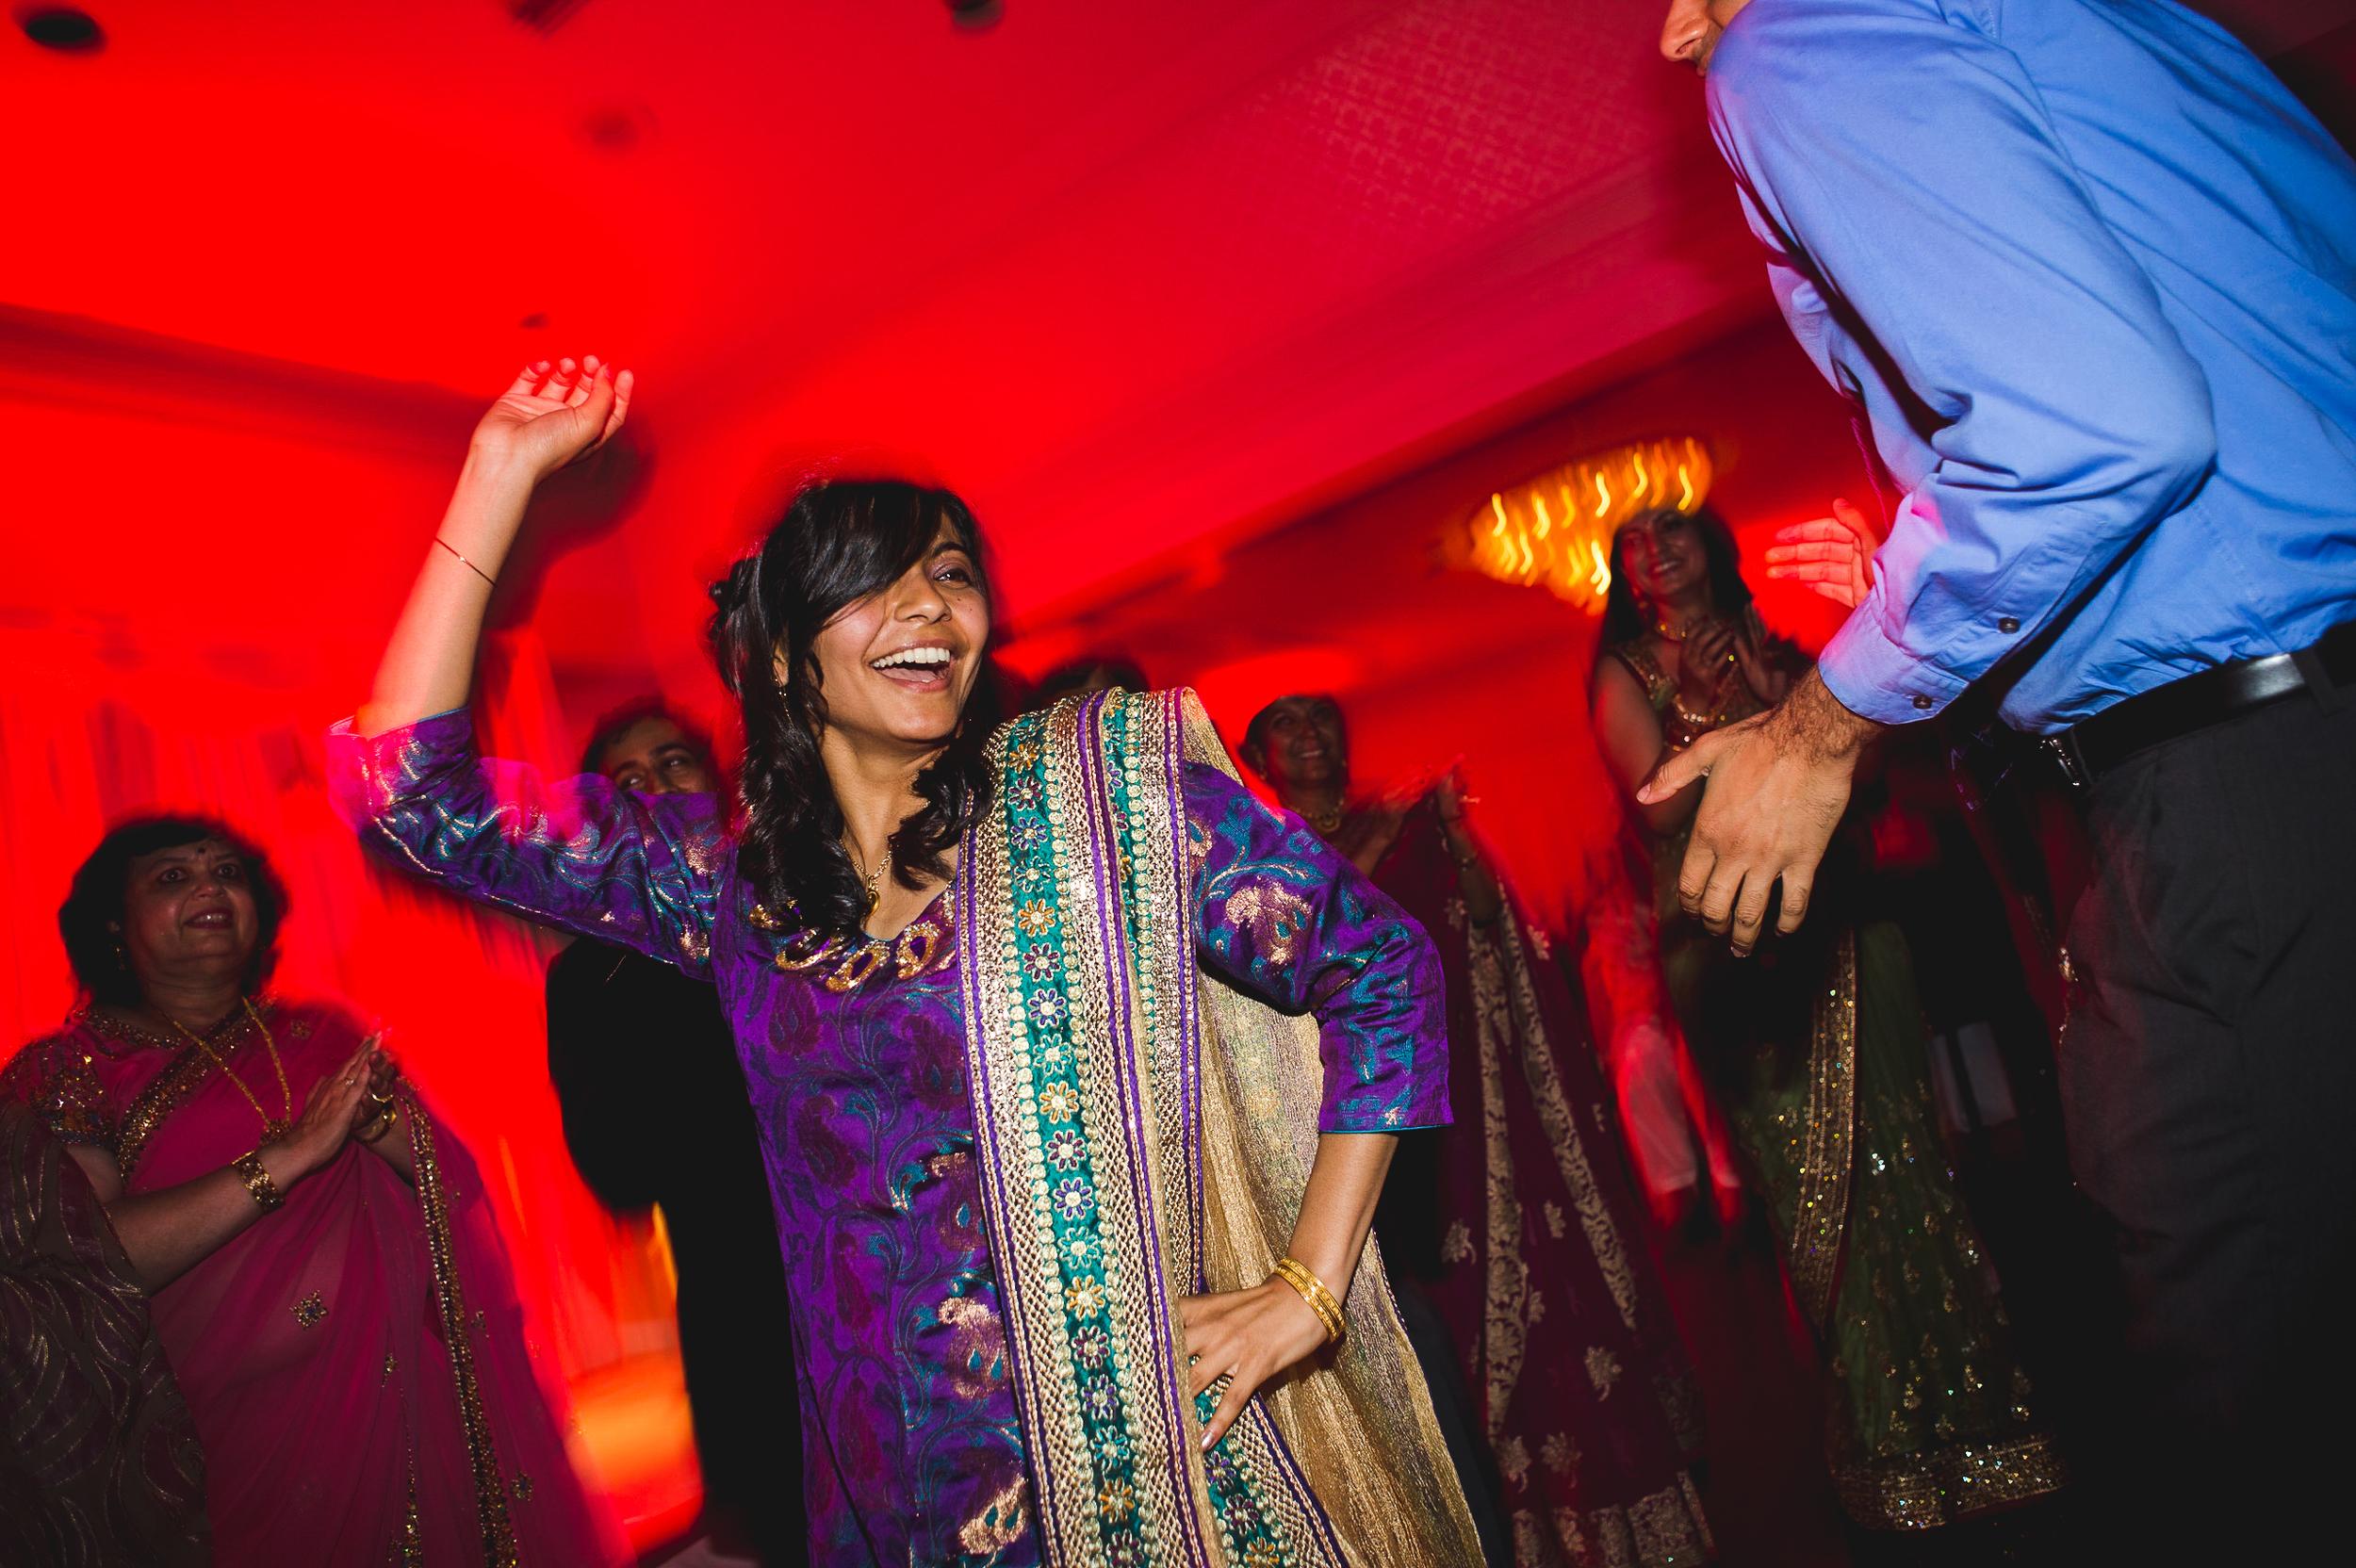 Indian wedding photographer washington dc Mantas Kubilinskas-20.jpg